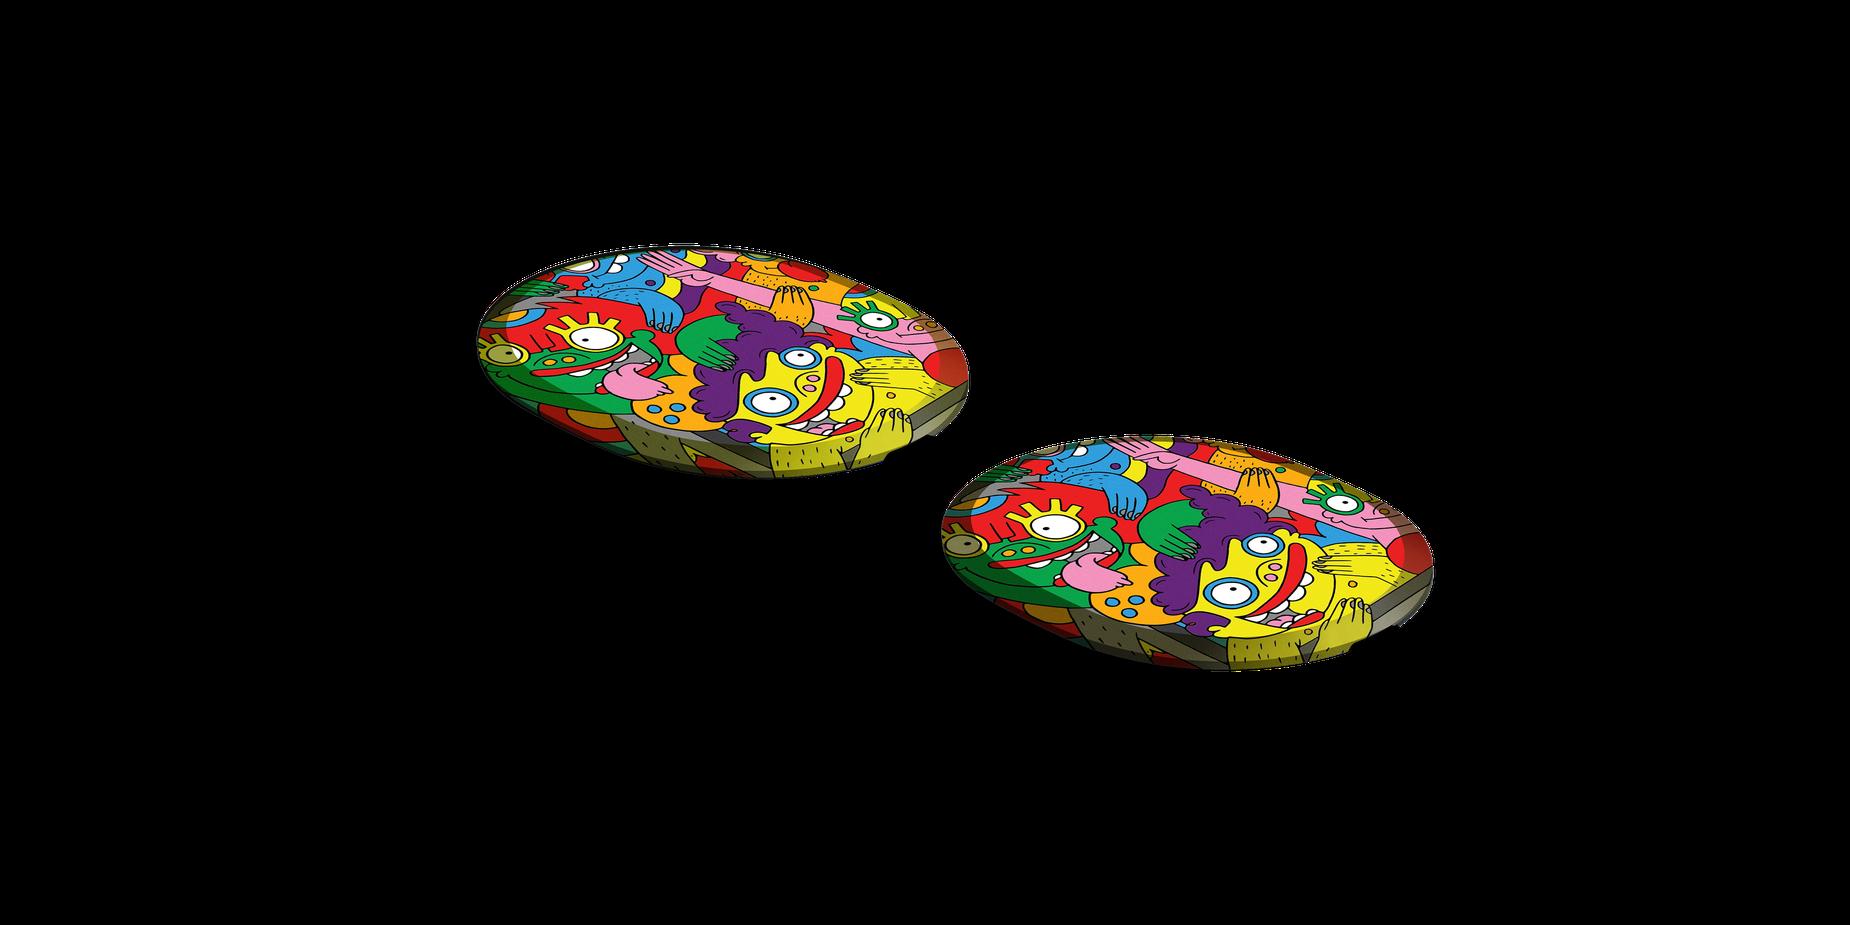 Two Arctis Pro speaker plates designed by artist Lauren Asta